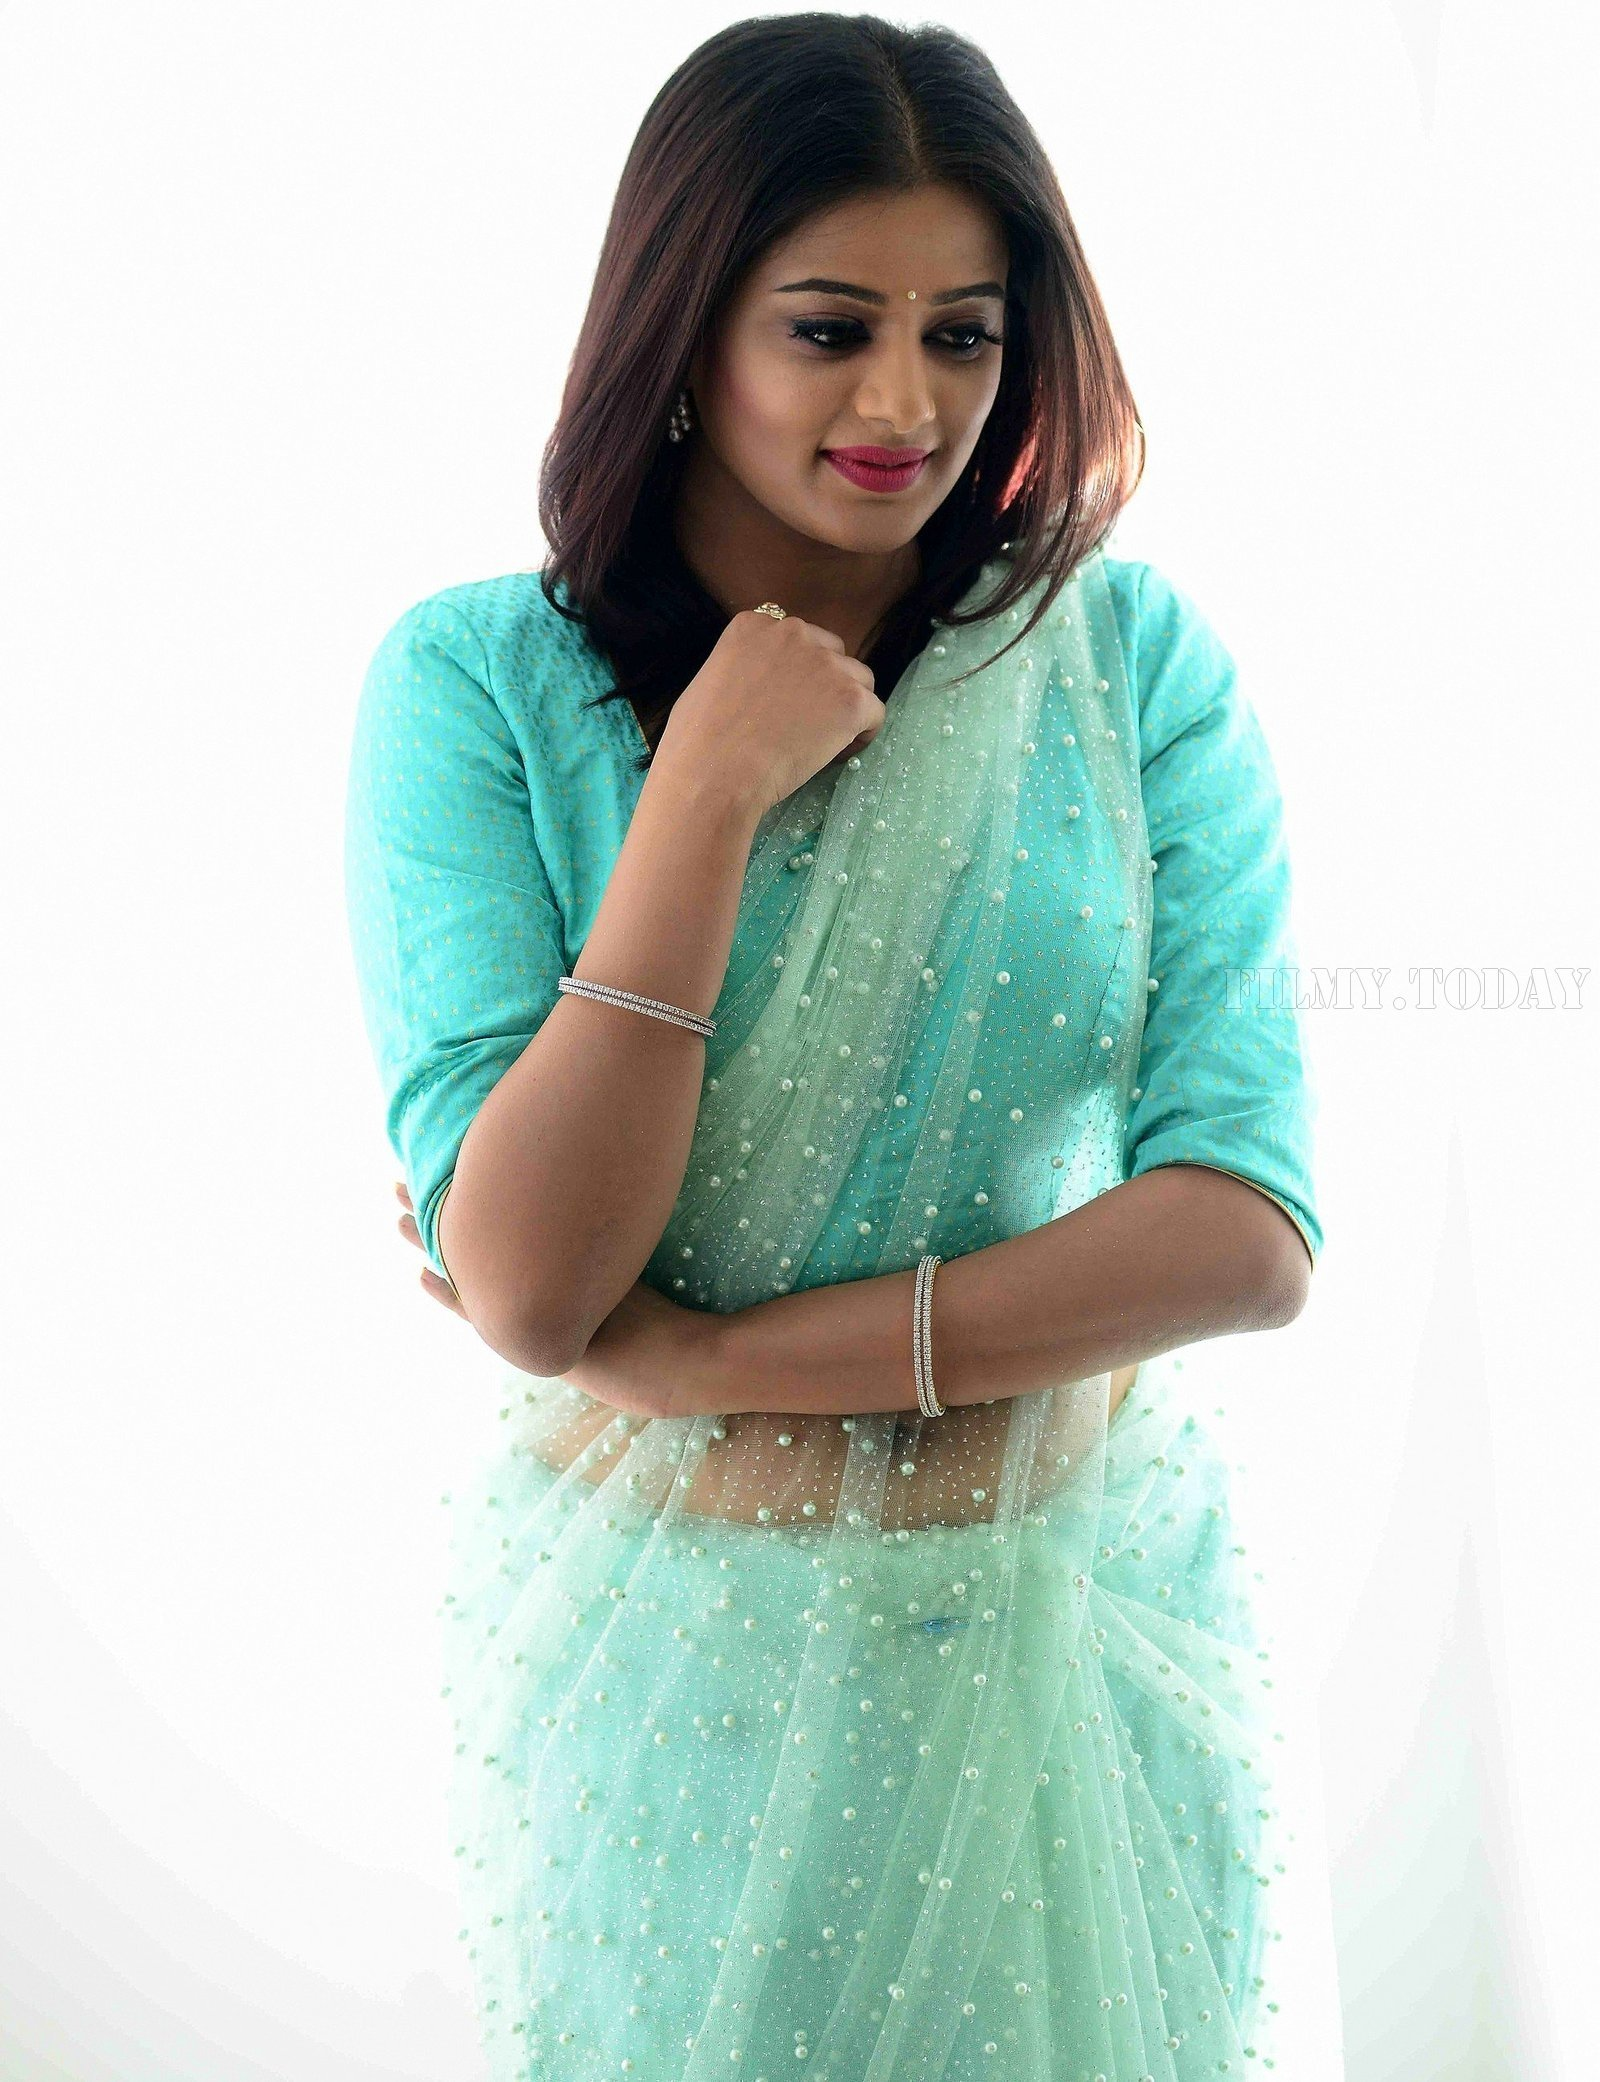 Actress Priya Mani Hot in Transparent Saree Photoshoot | Picture 1528091